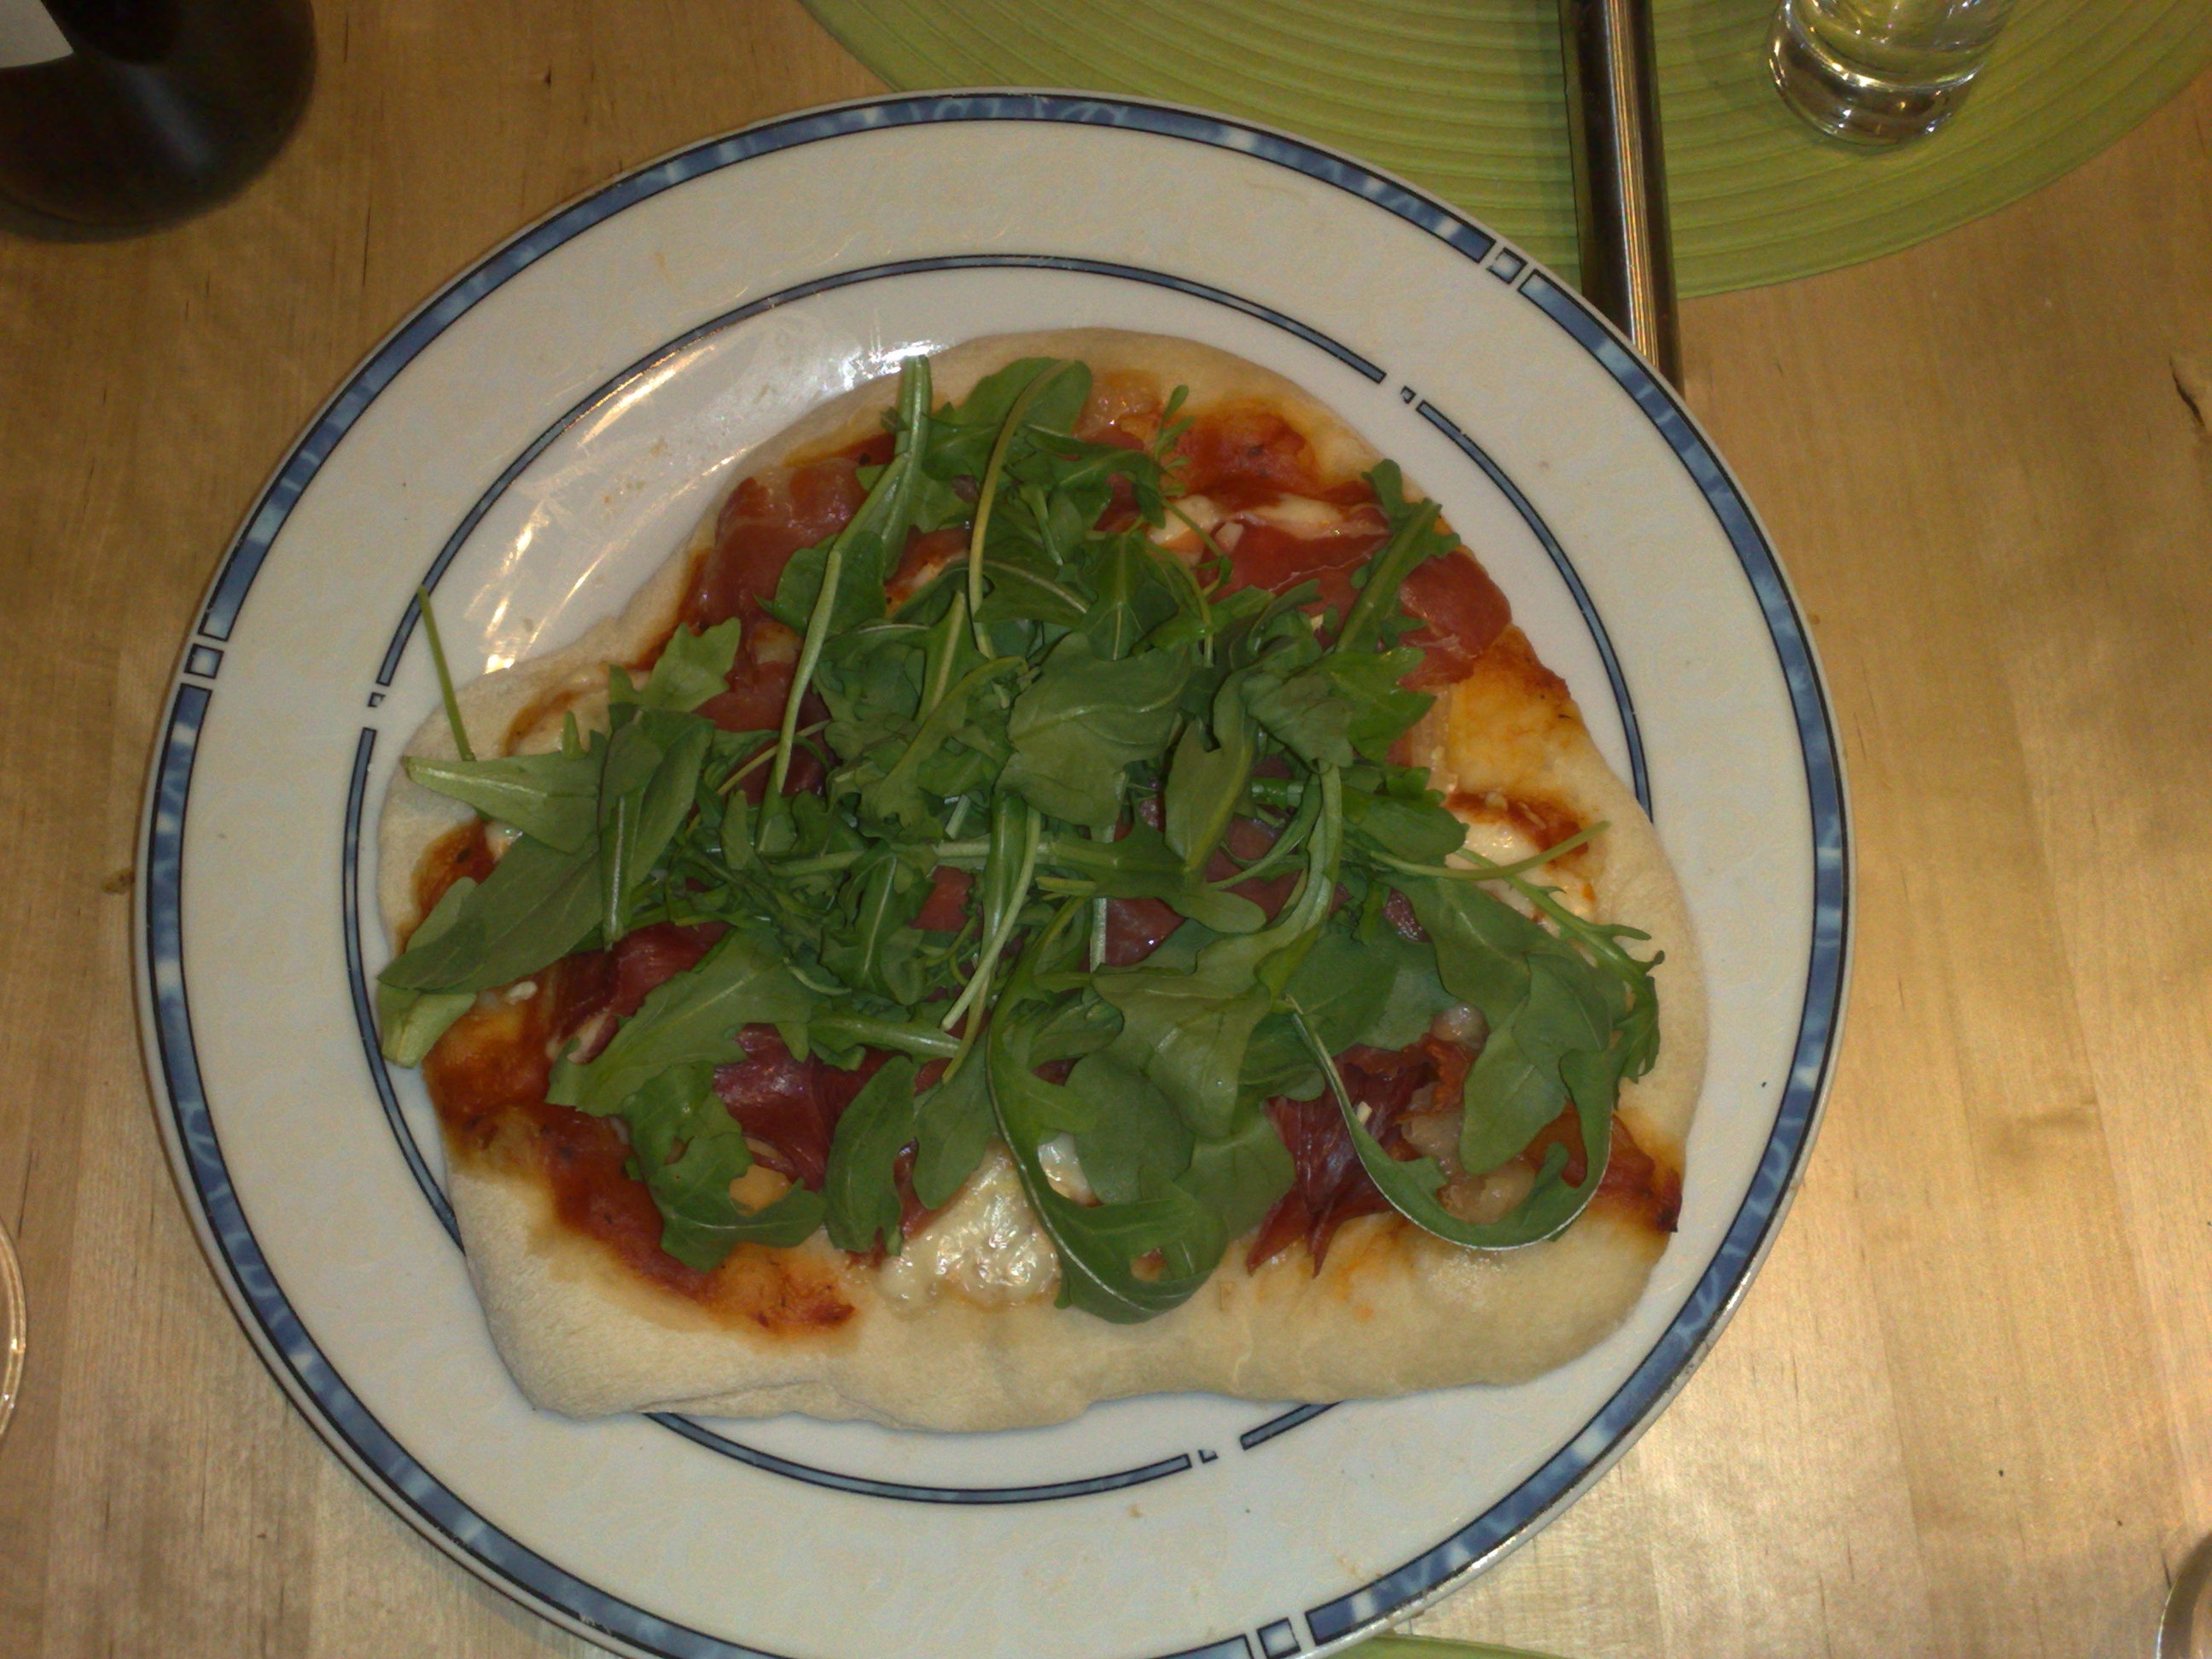 Weber Elektrogrill Pizza Backen : Pizza aus dem webergrill? funktioniert das tatsächlich? wer hats